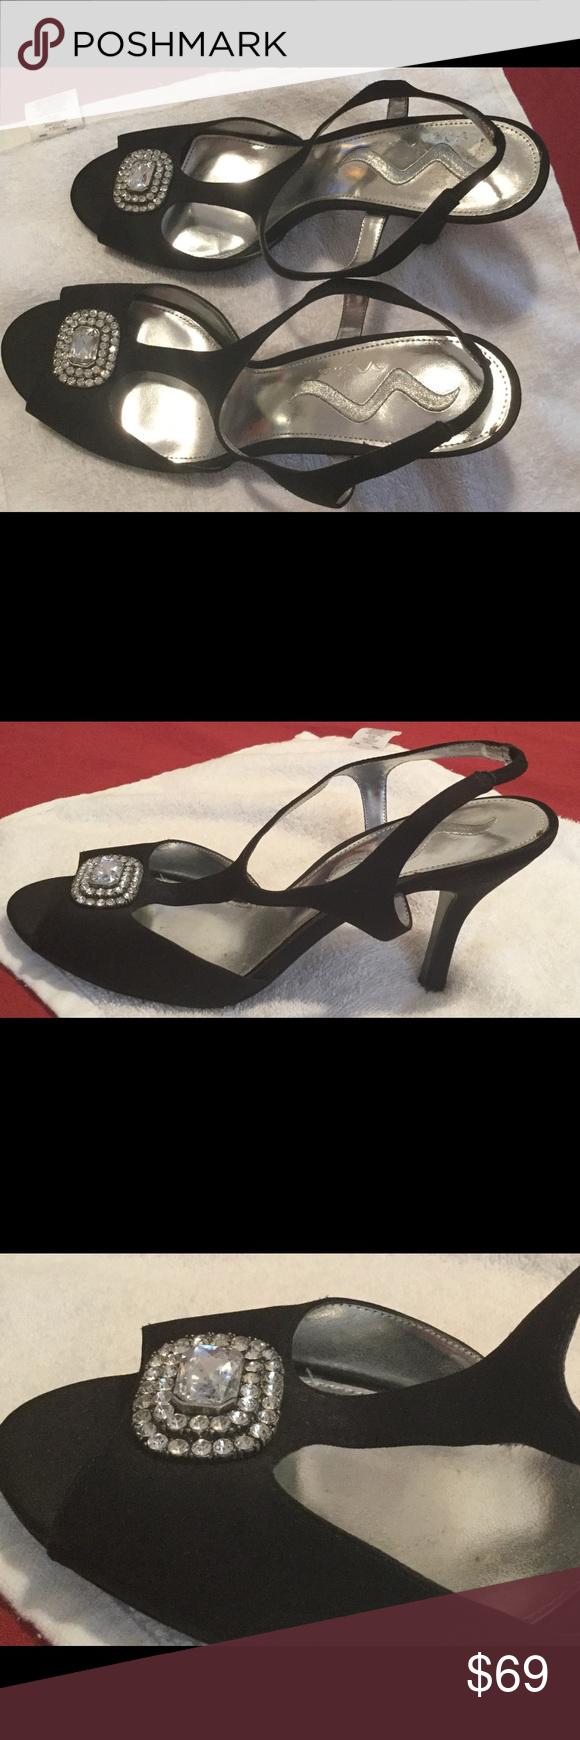 Black sandals 2 inch heel - Black Satin